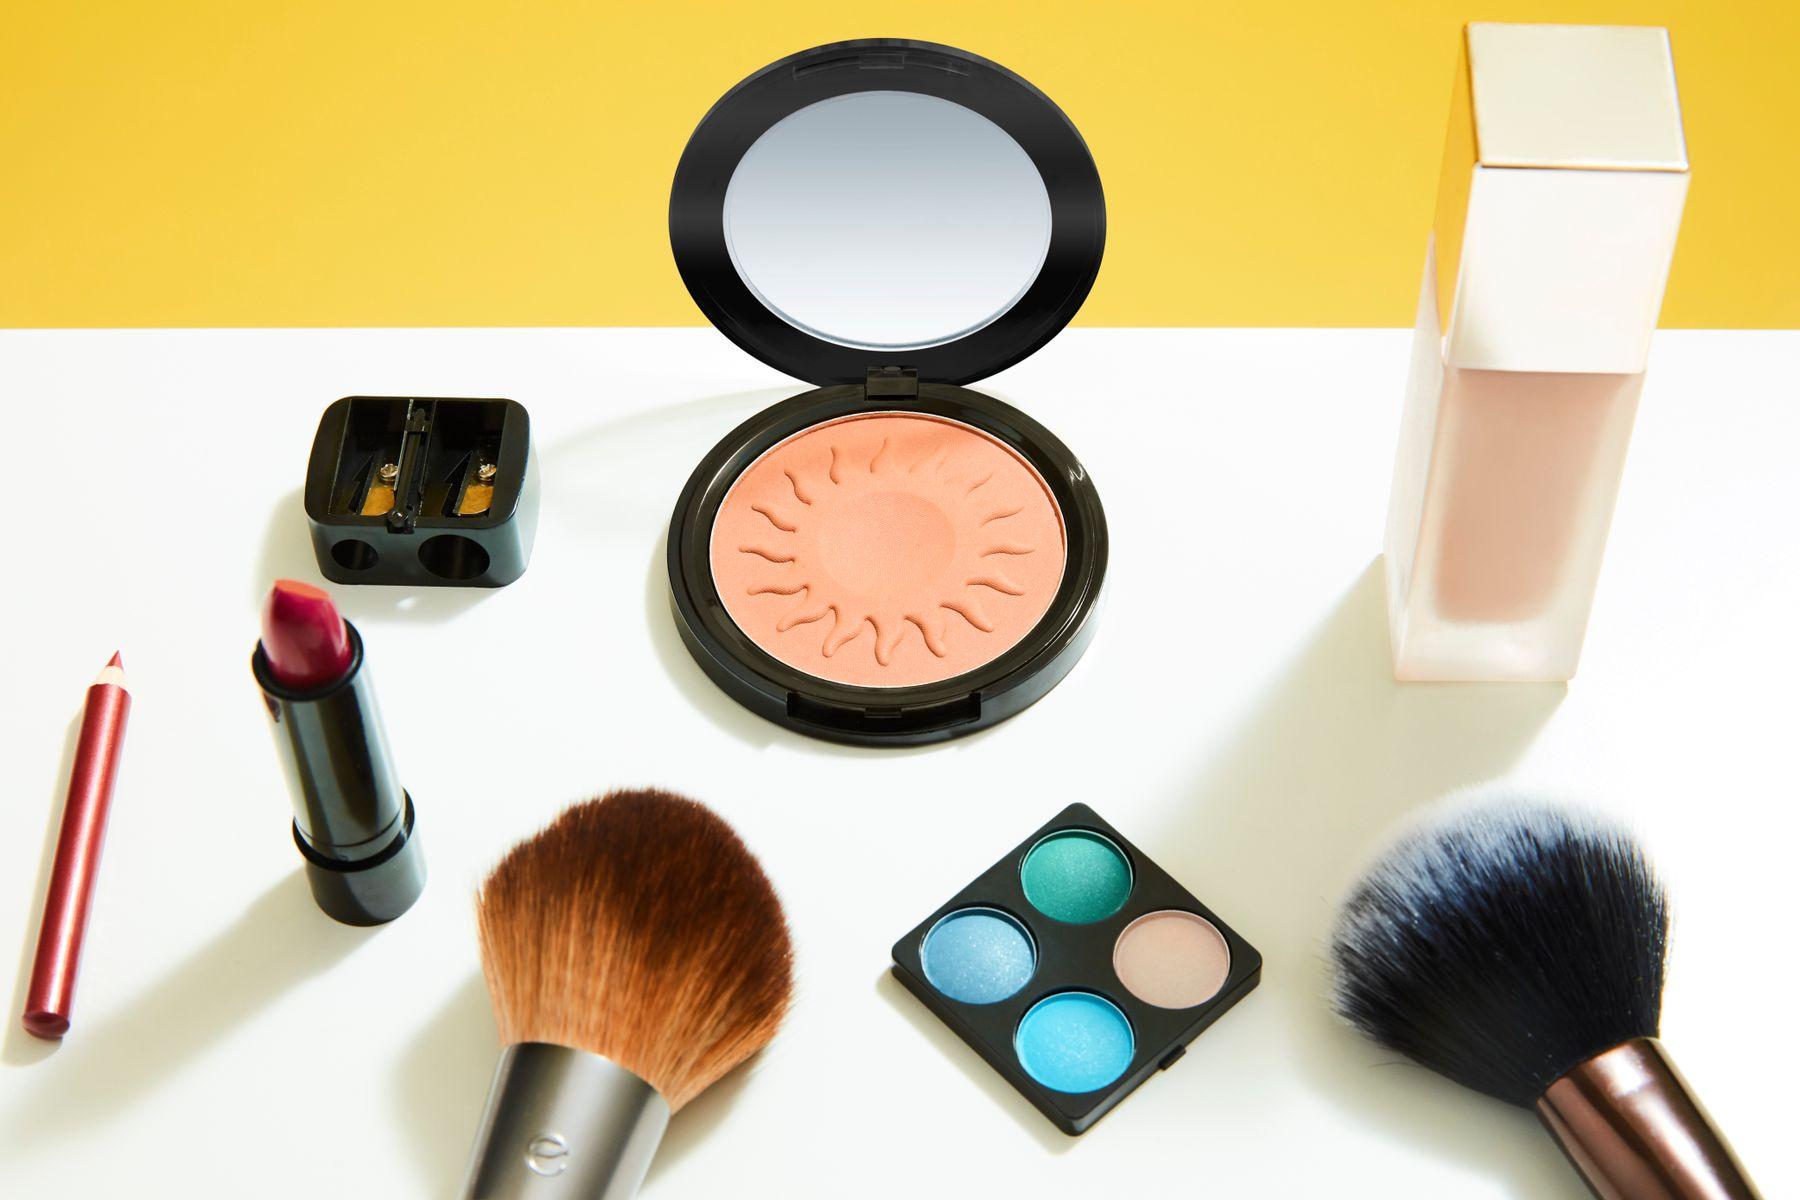 Cómo sacar manchas de maquillaje de ropa blanca correctamente